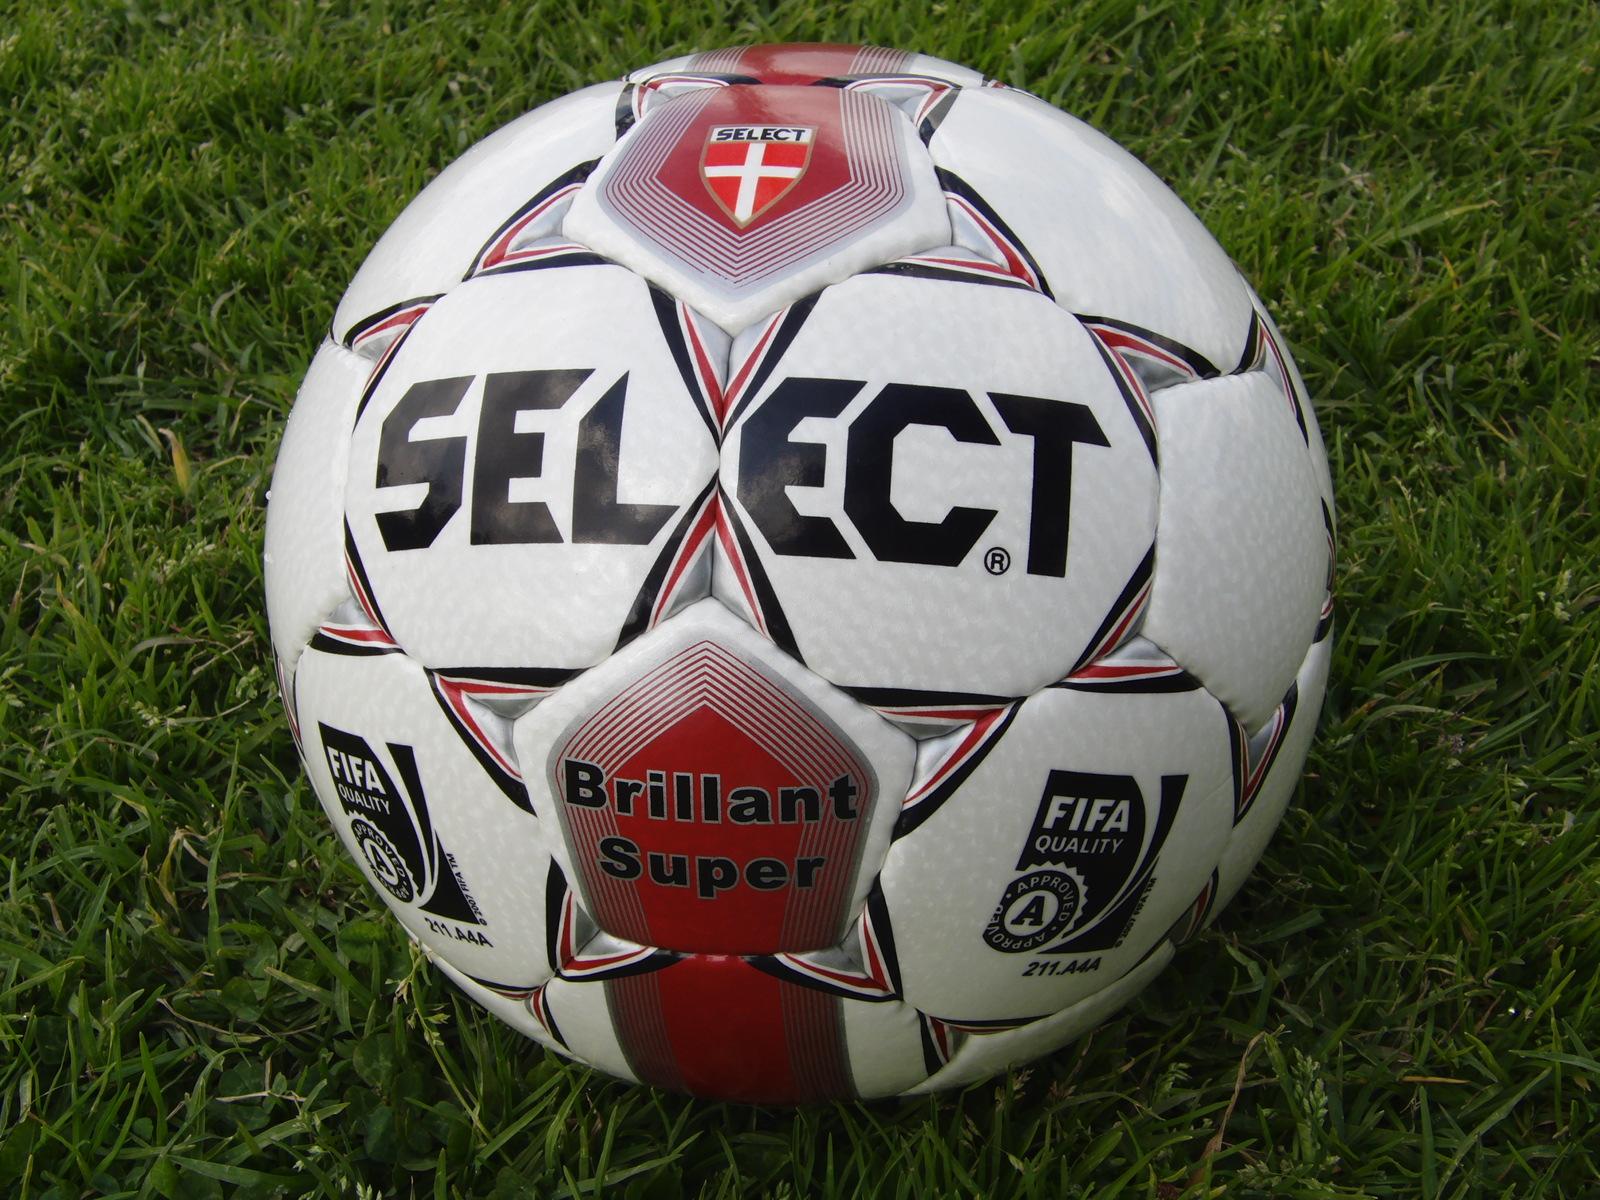 Select Brilliant Super